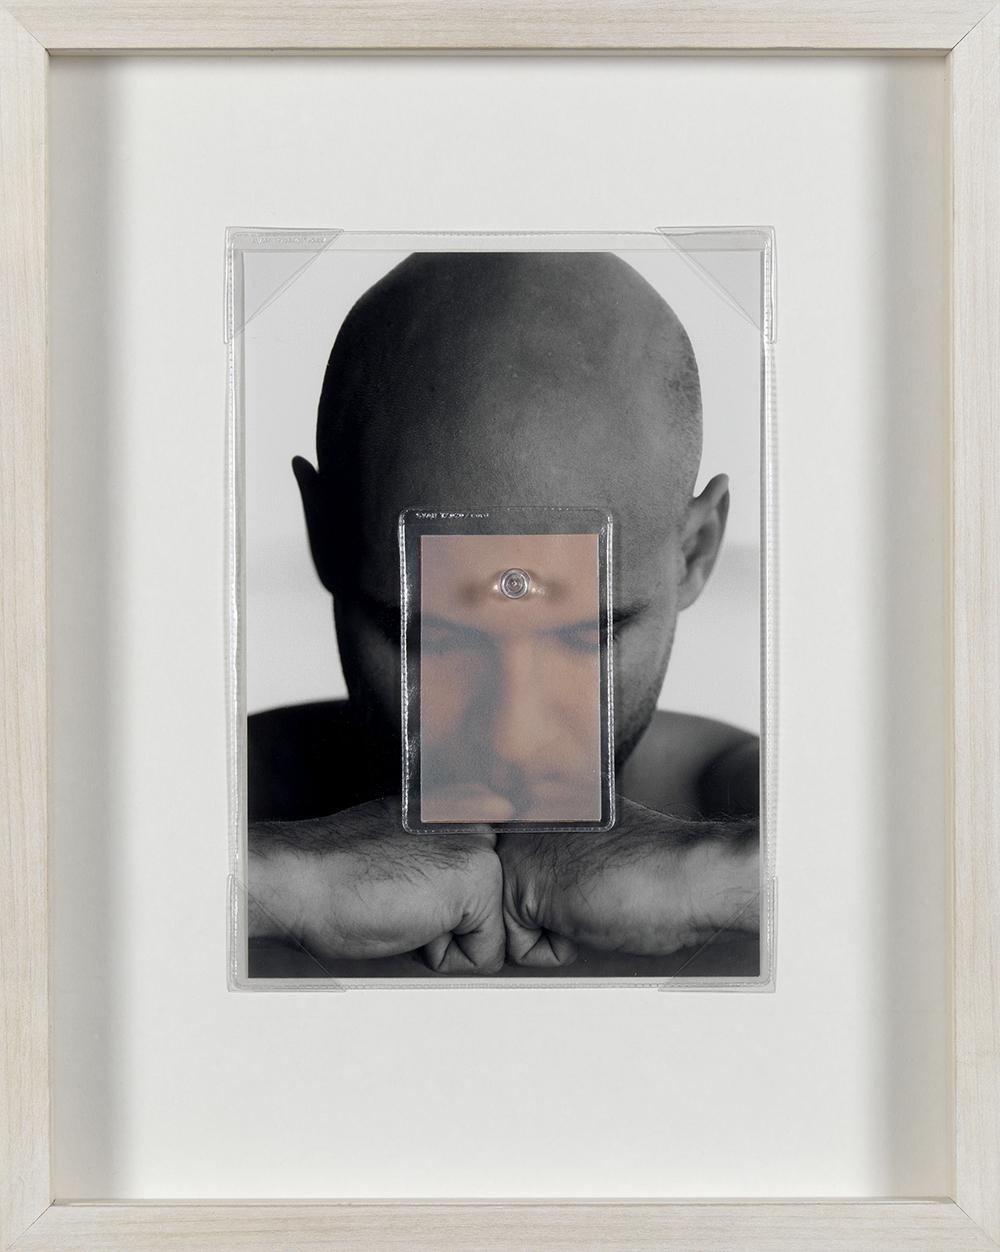 Simen, 2007, tecnica mista, cm 36.3x29